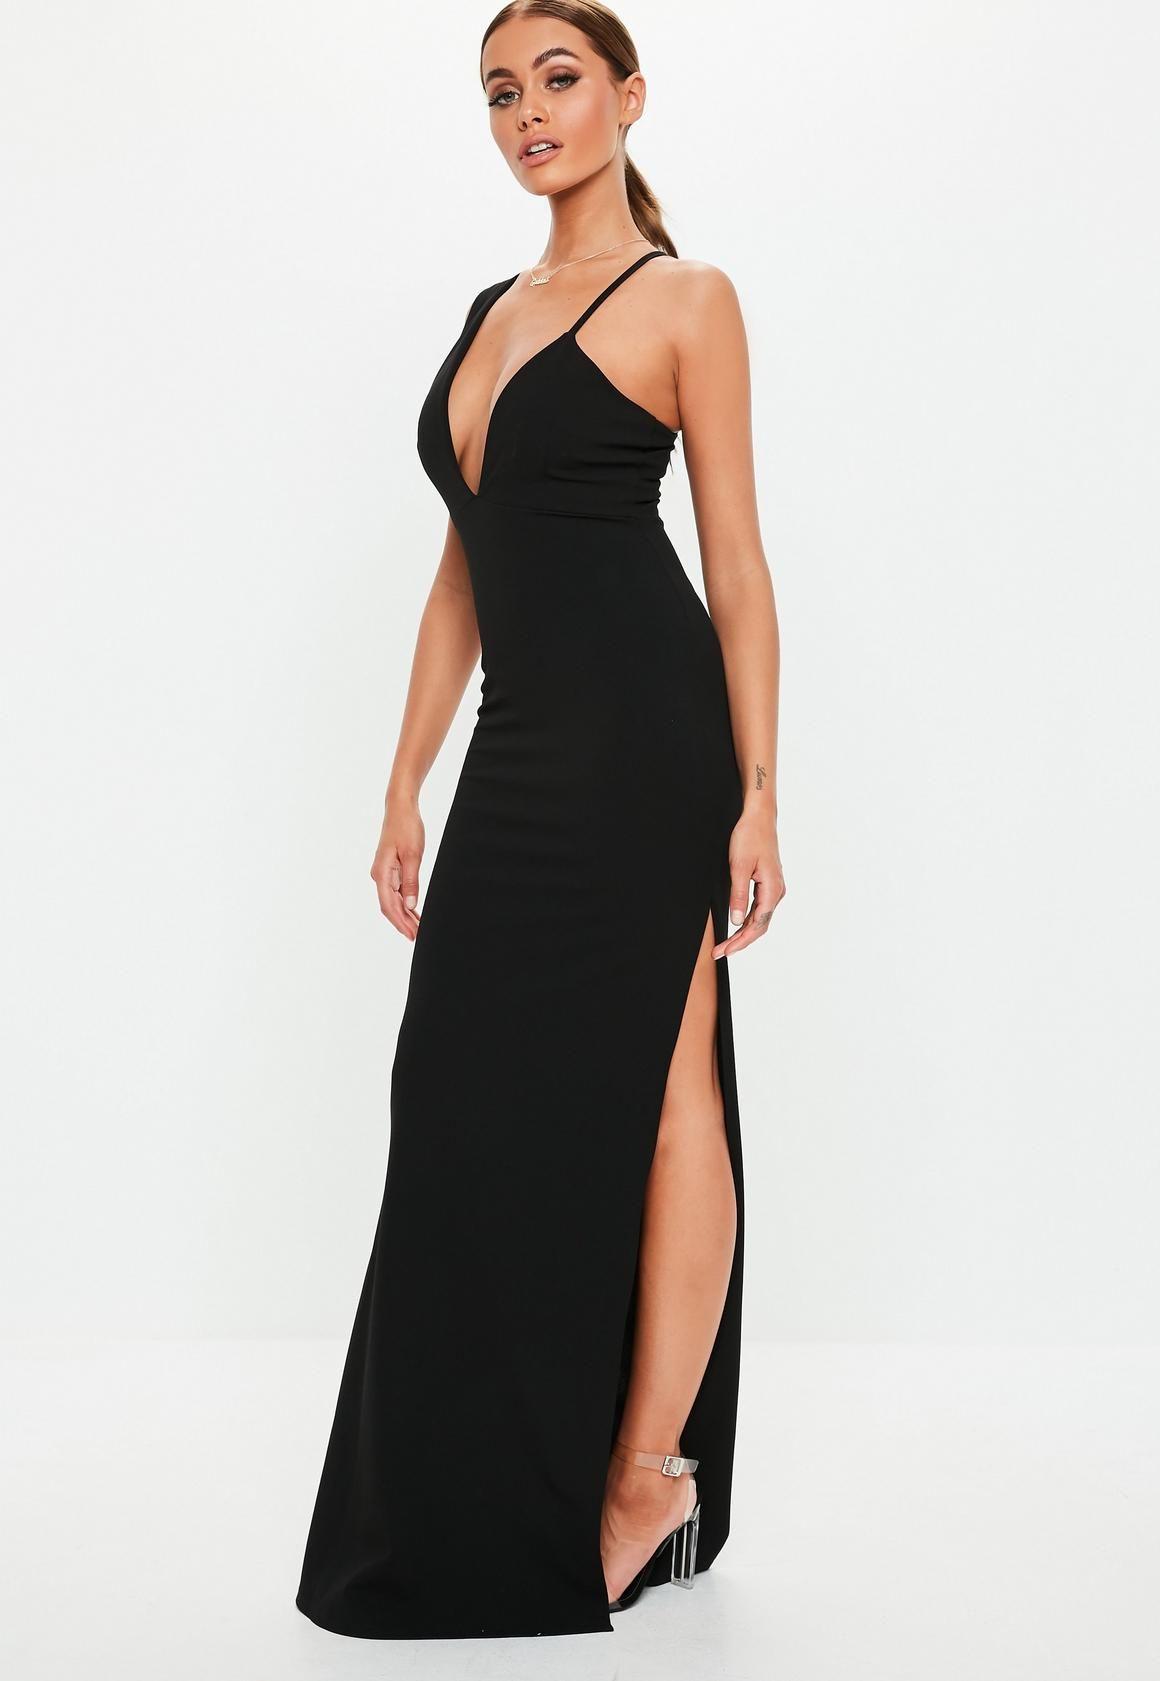 f0f5d392c28 Czarna sukienka maxi na jedno ramię w 2019